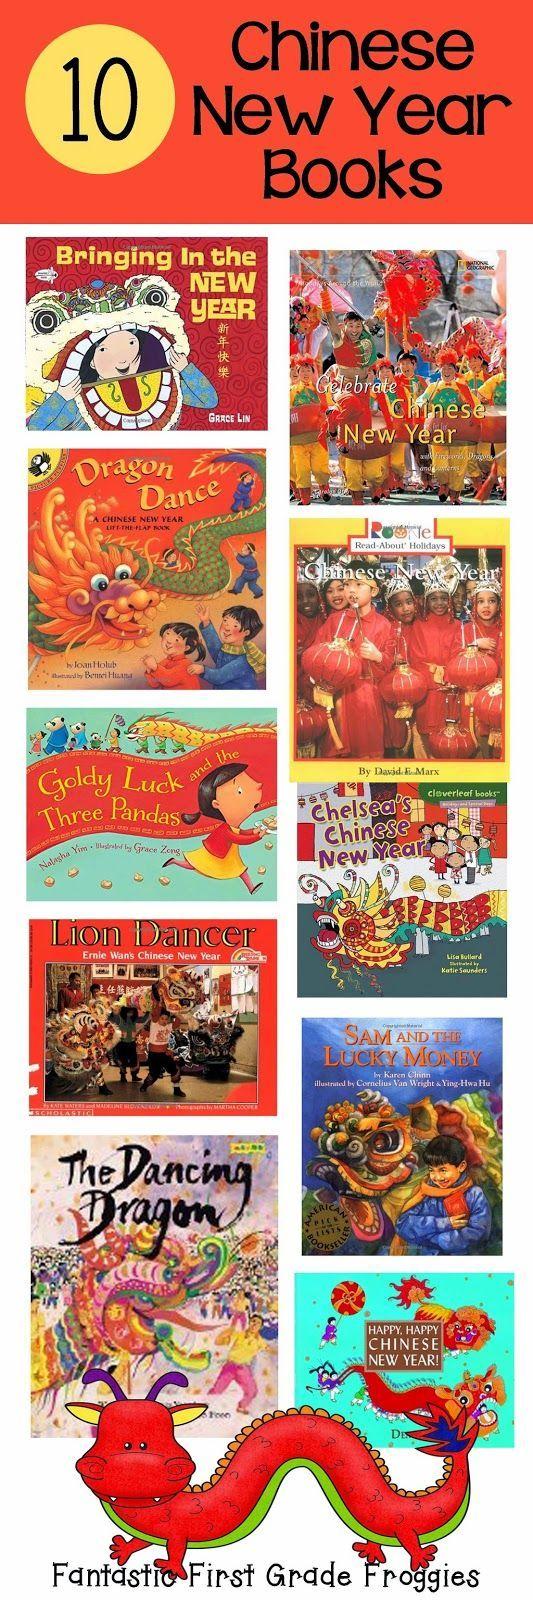 12398 best kindergarten learning images on pinterest preschool teaching ideas and school. Black Bedroom Furniture Sets. Home Design Ideas